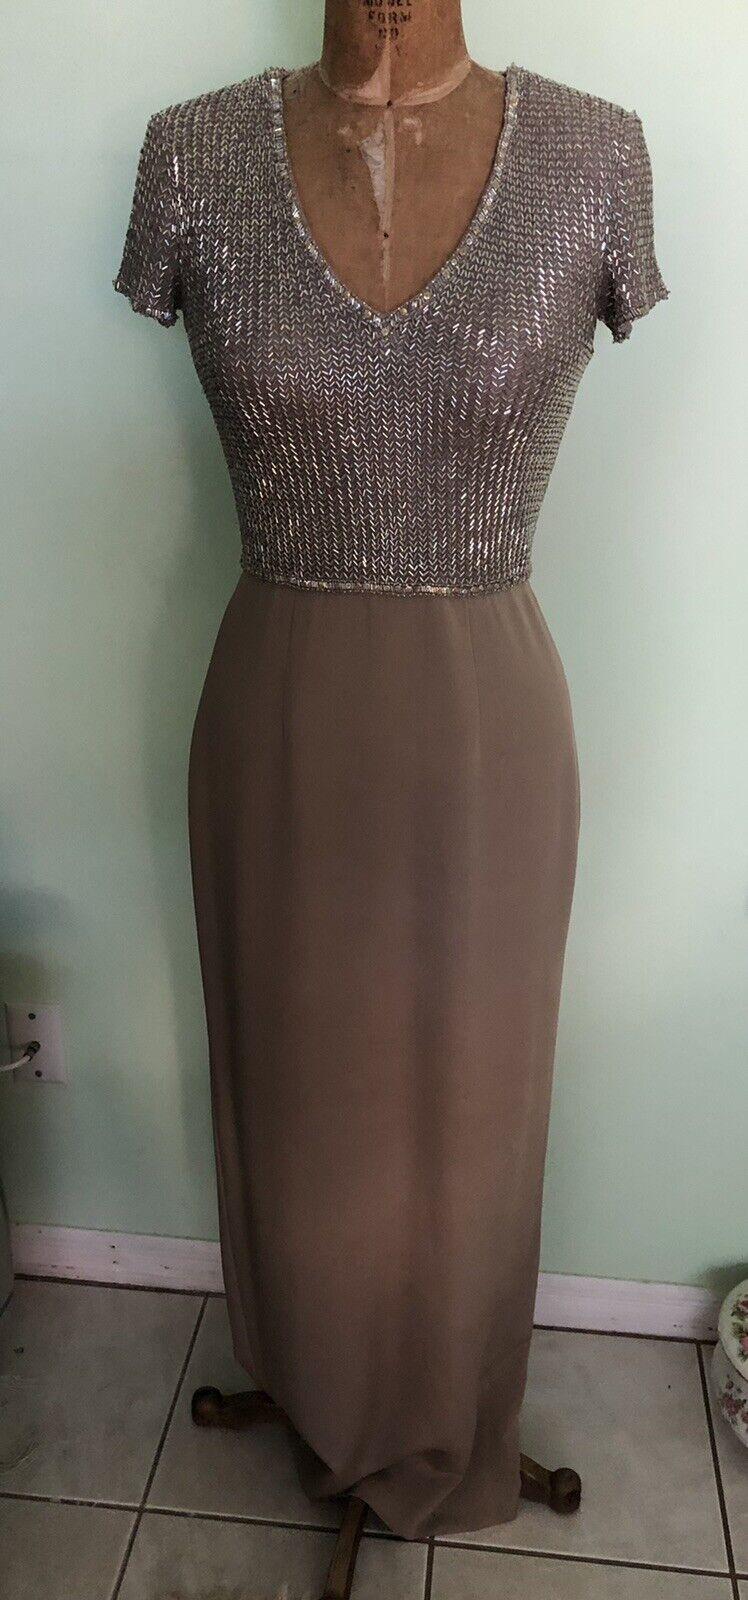 VICTORIA stunning silk silver beaded light beige evening gown size 4